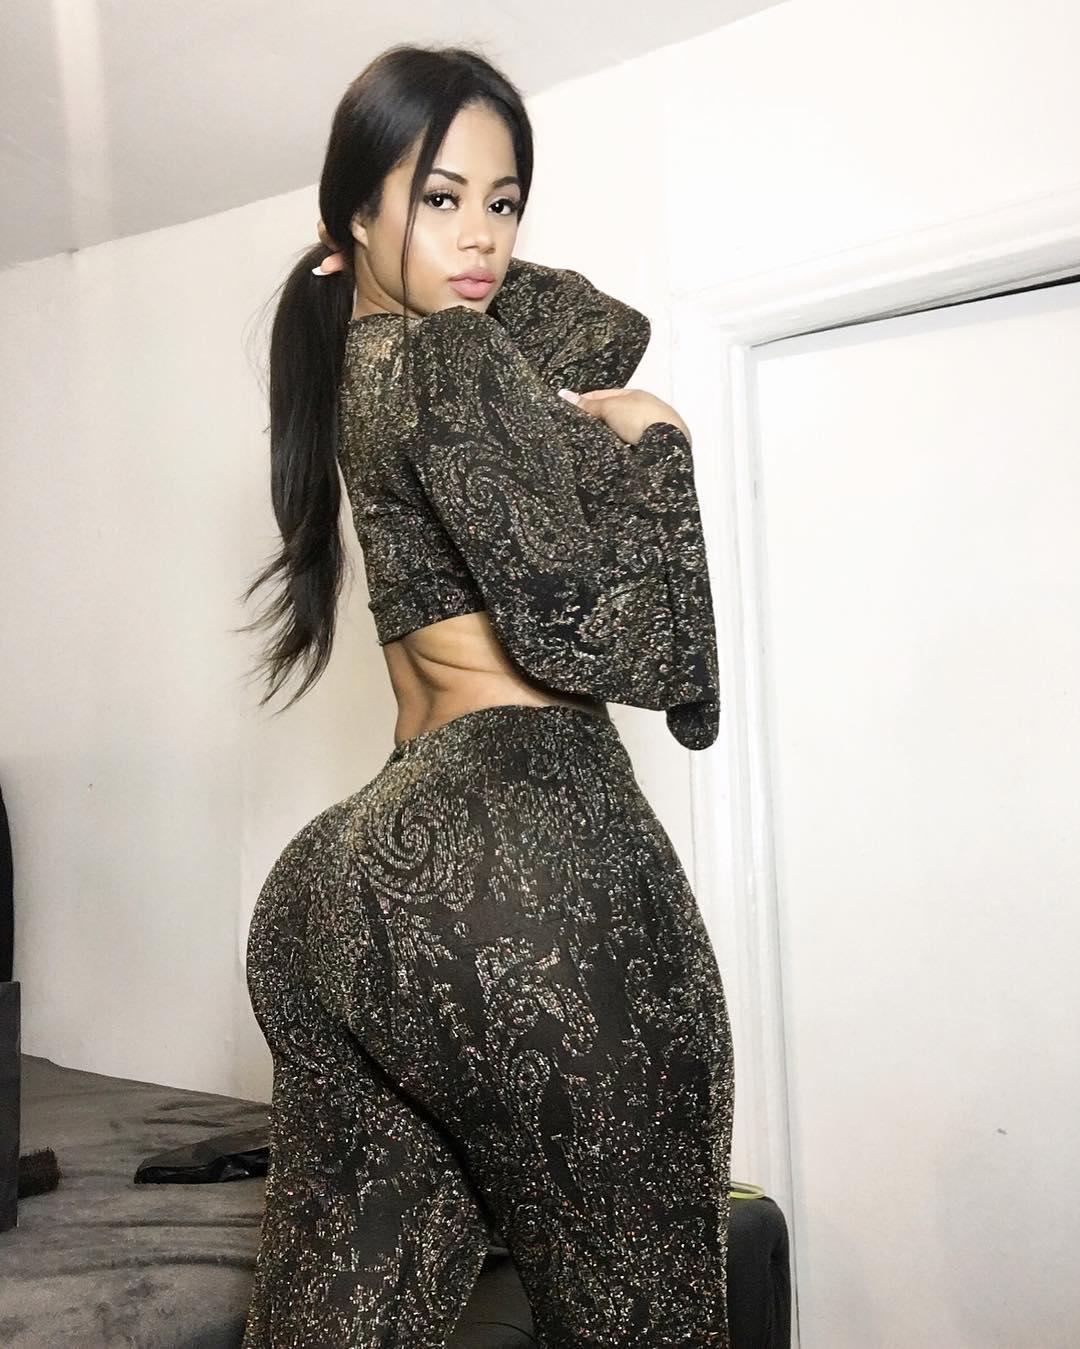 Strella Kat Hot Instagram Photos Nsfw  Bootymotiontv-9249